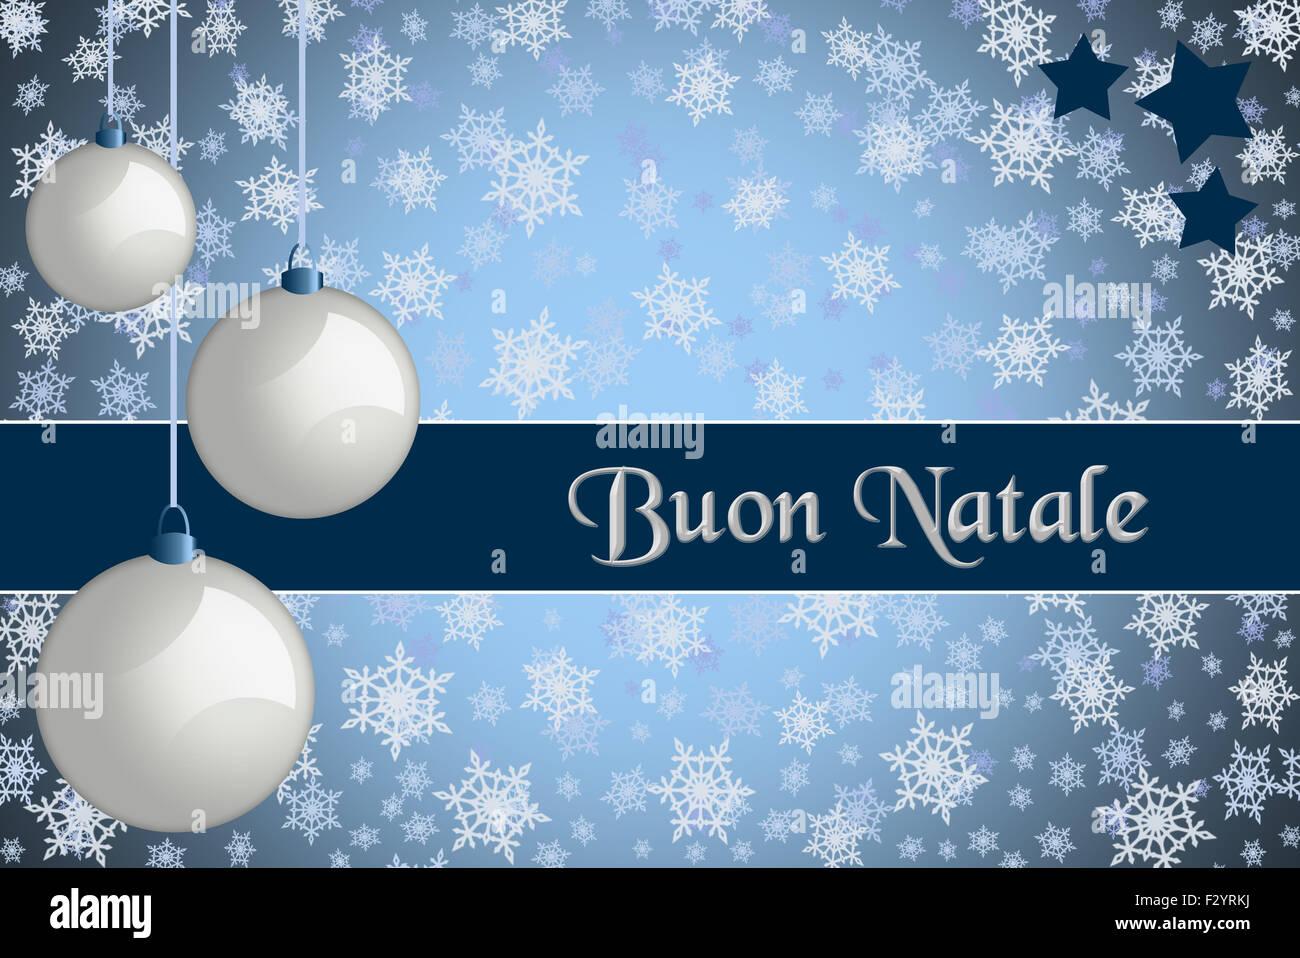 Buon Natale Ornament.Christmas Greeting Card Buon Natale Blue Colored Christmas Card